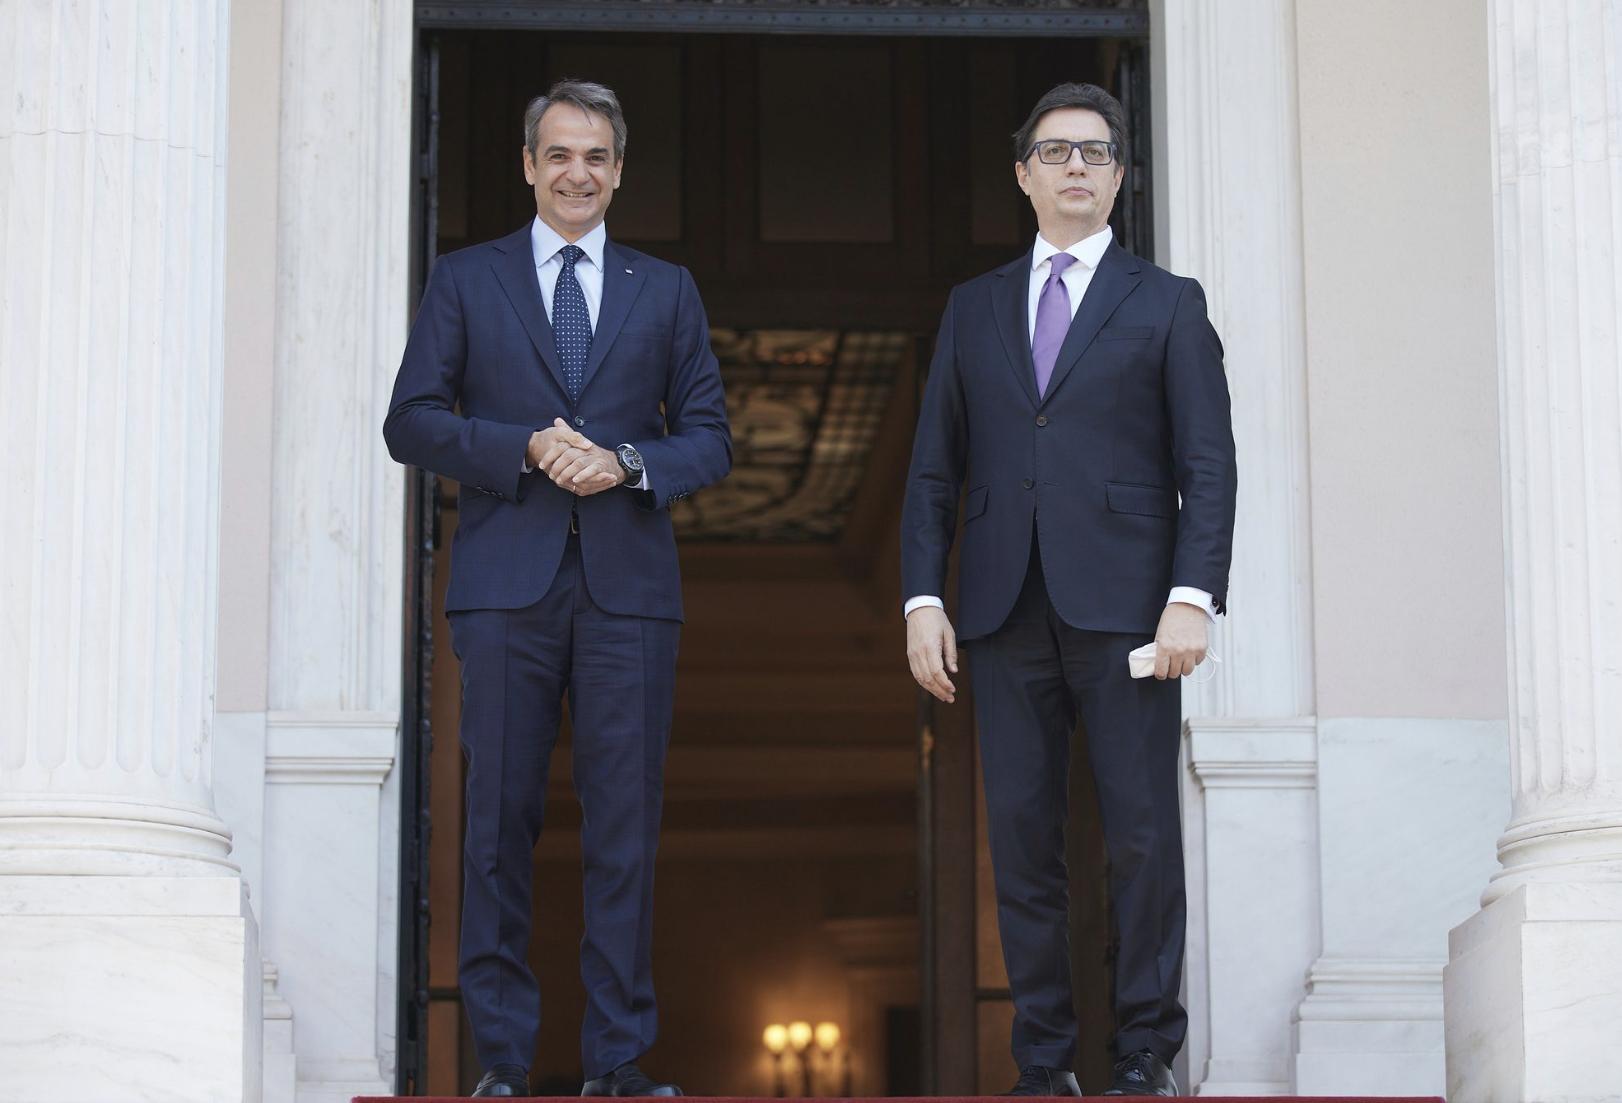 Greece: Kyriakos Mitsotakis met with the President of North Macedonia